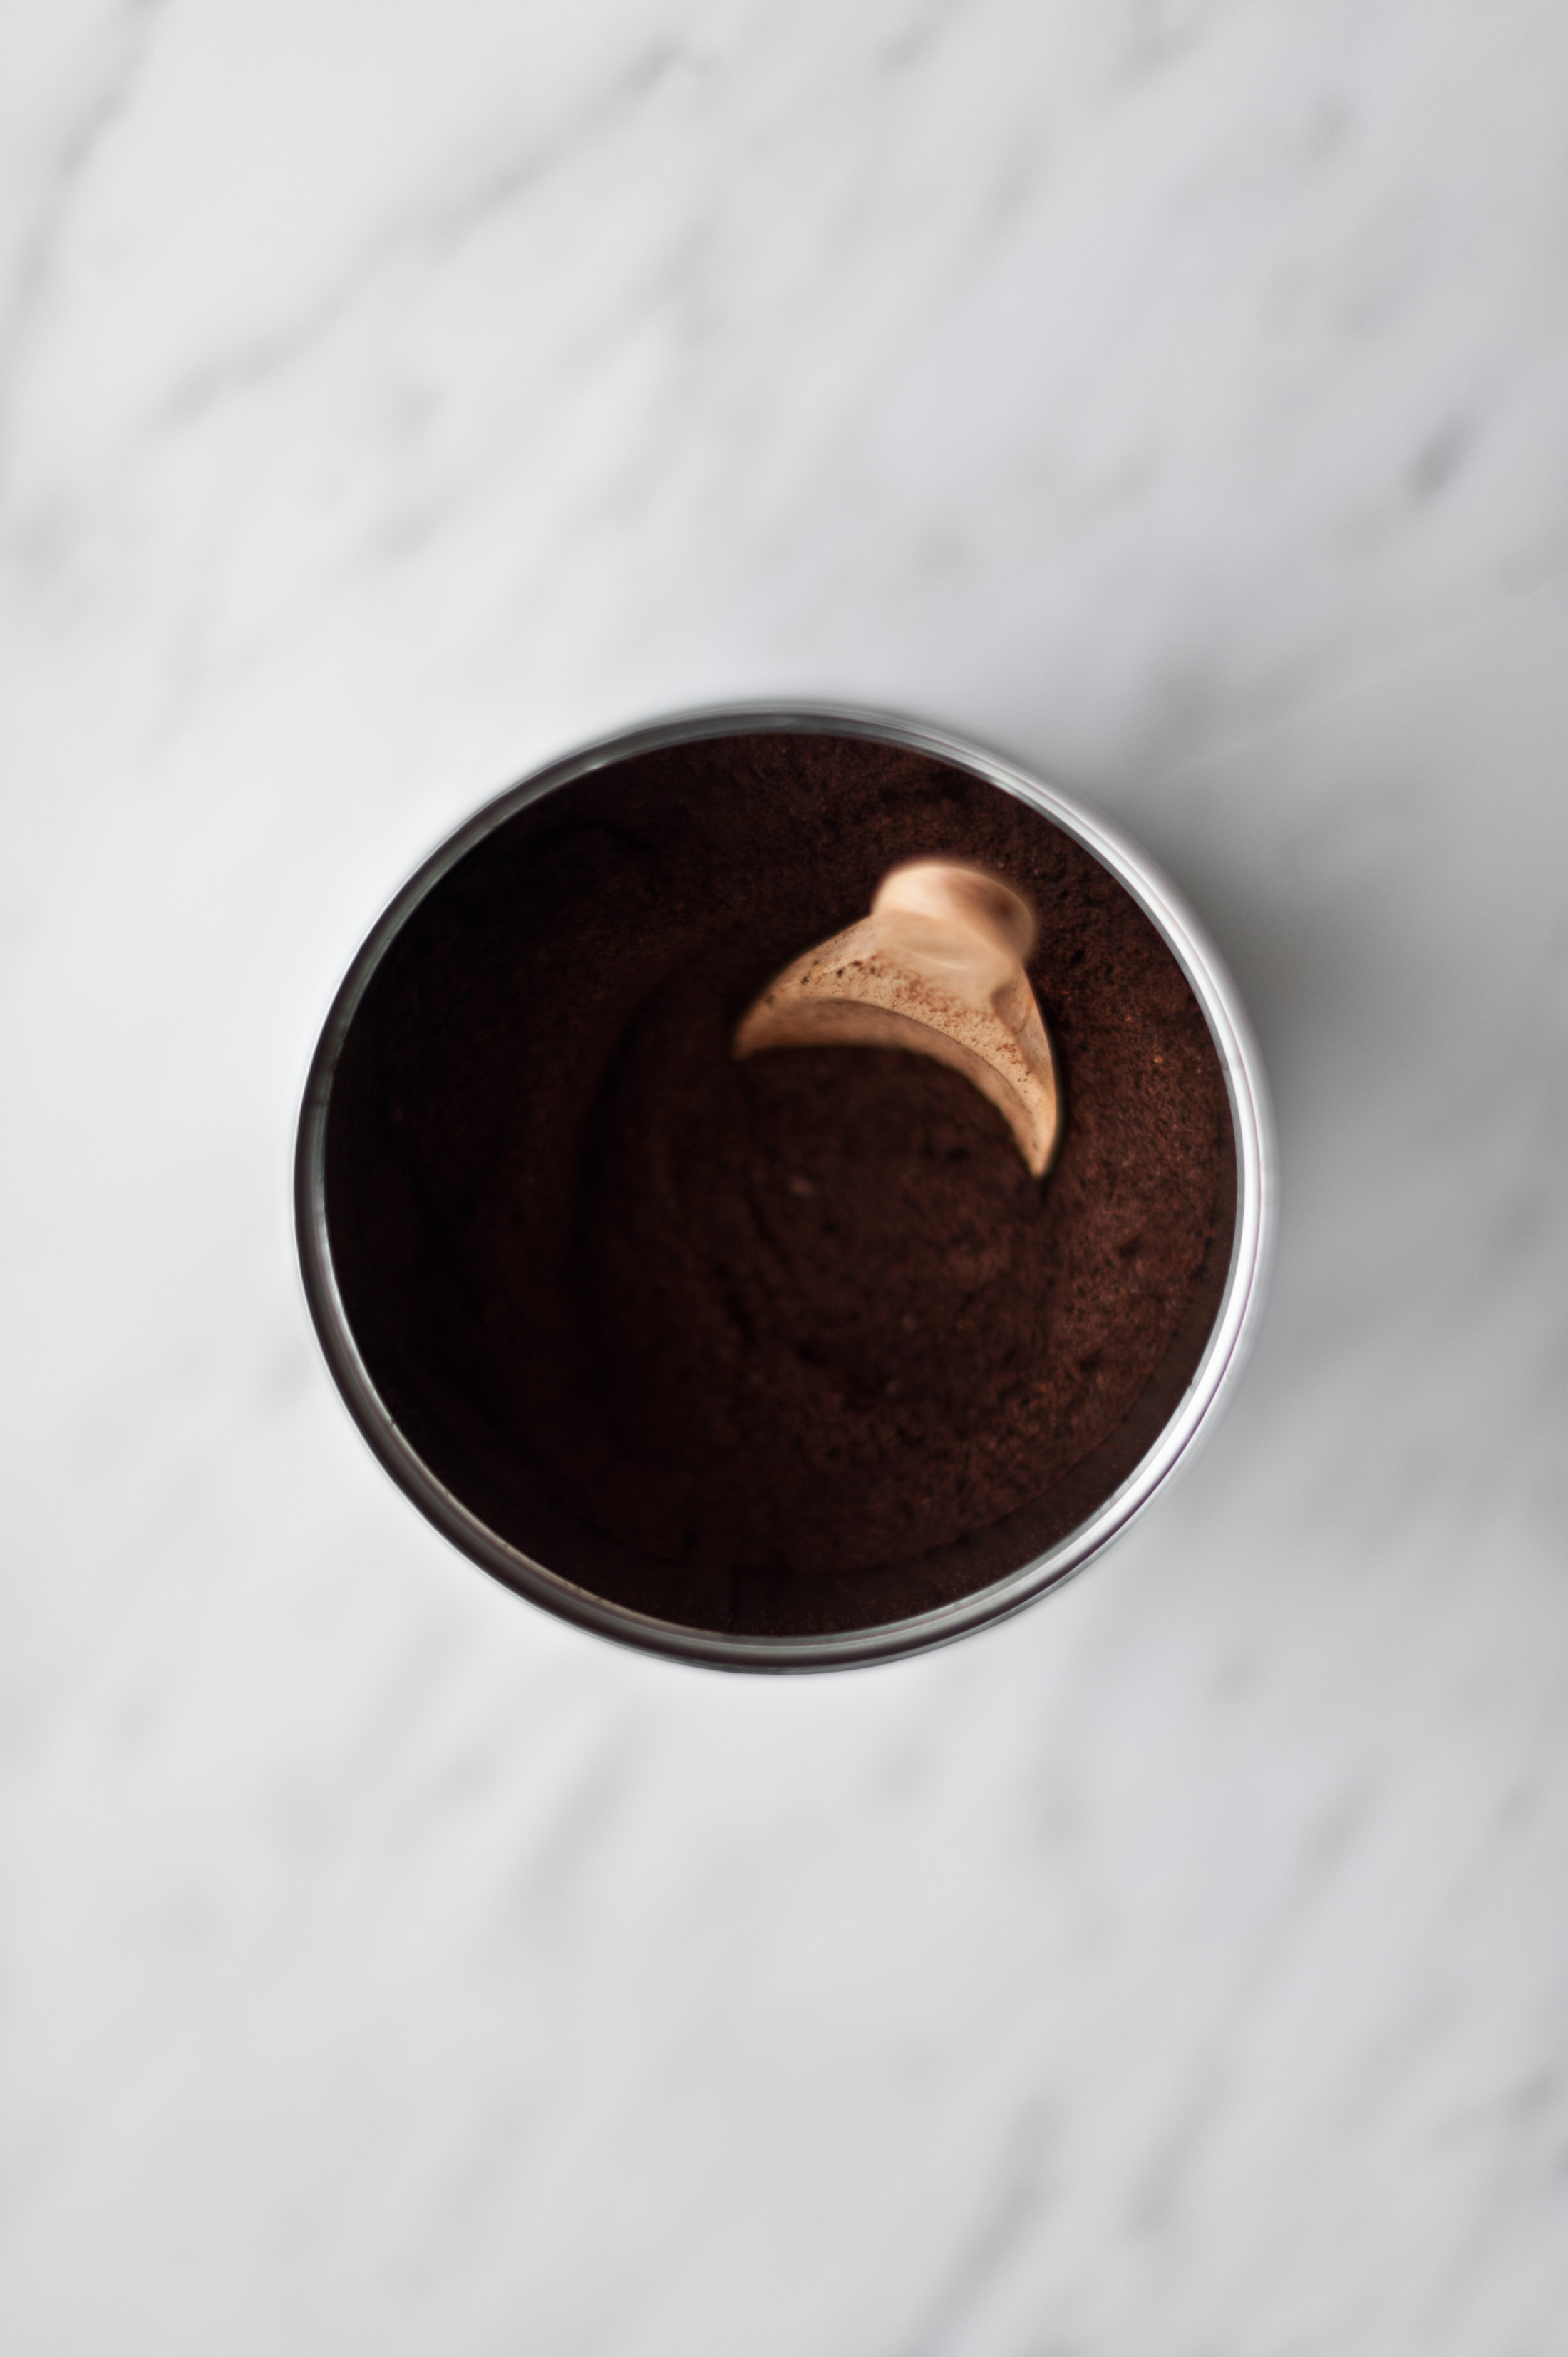 Moka Pot Coffee - (c) Valeria Necchio.jpg